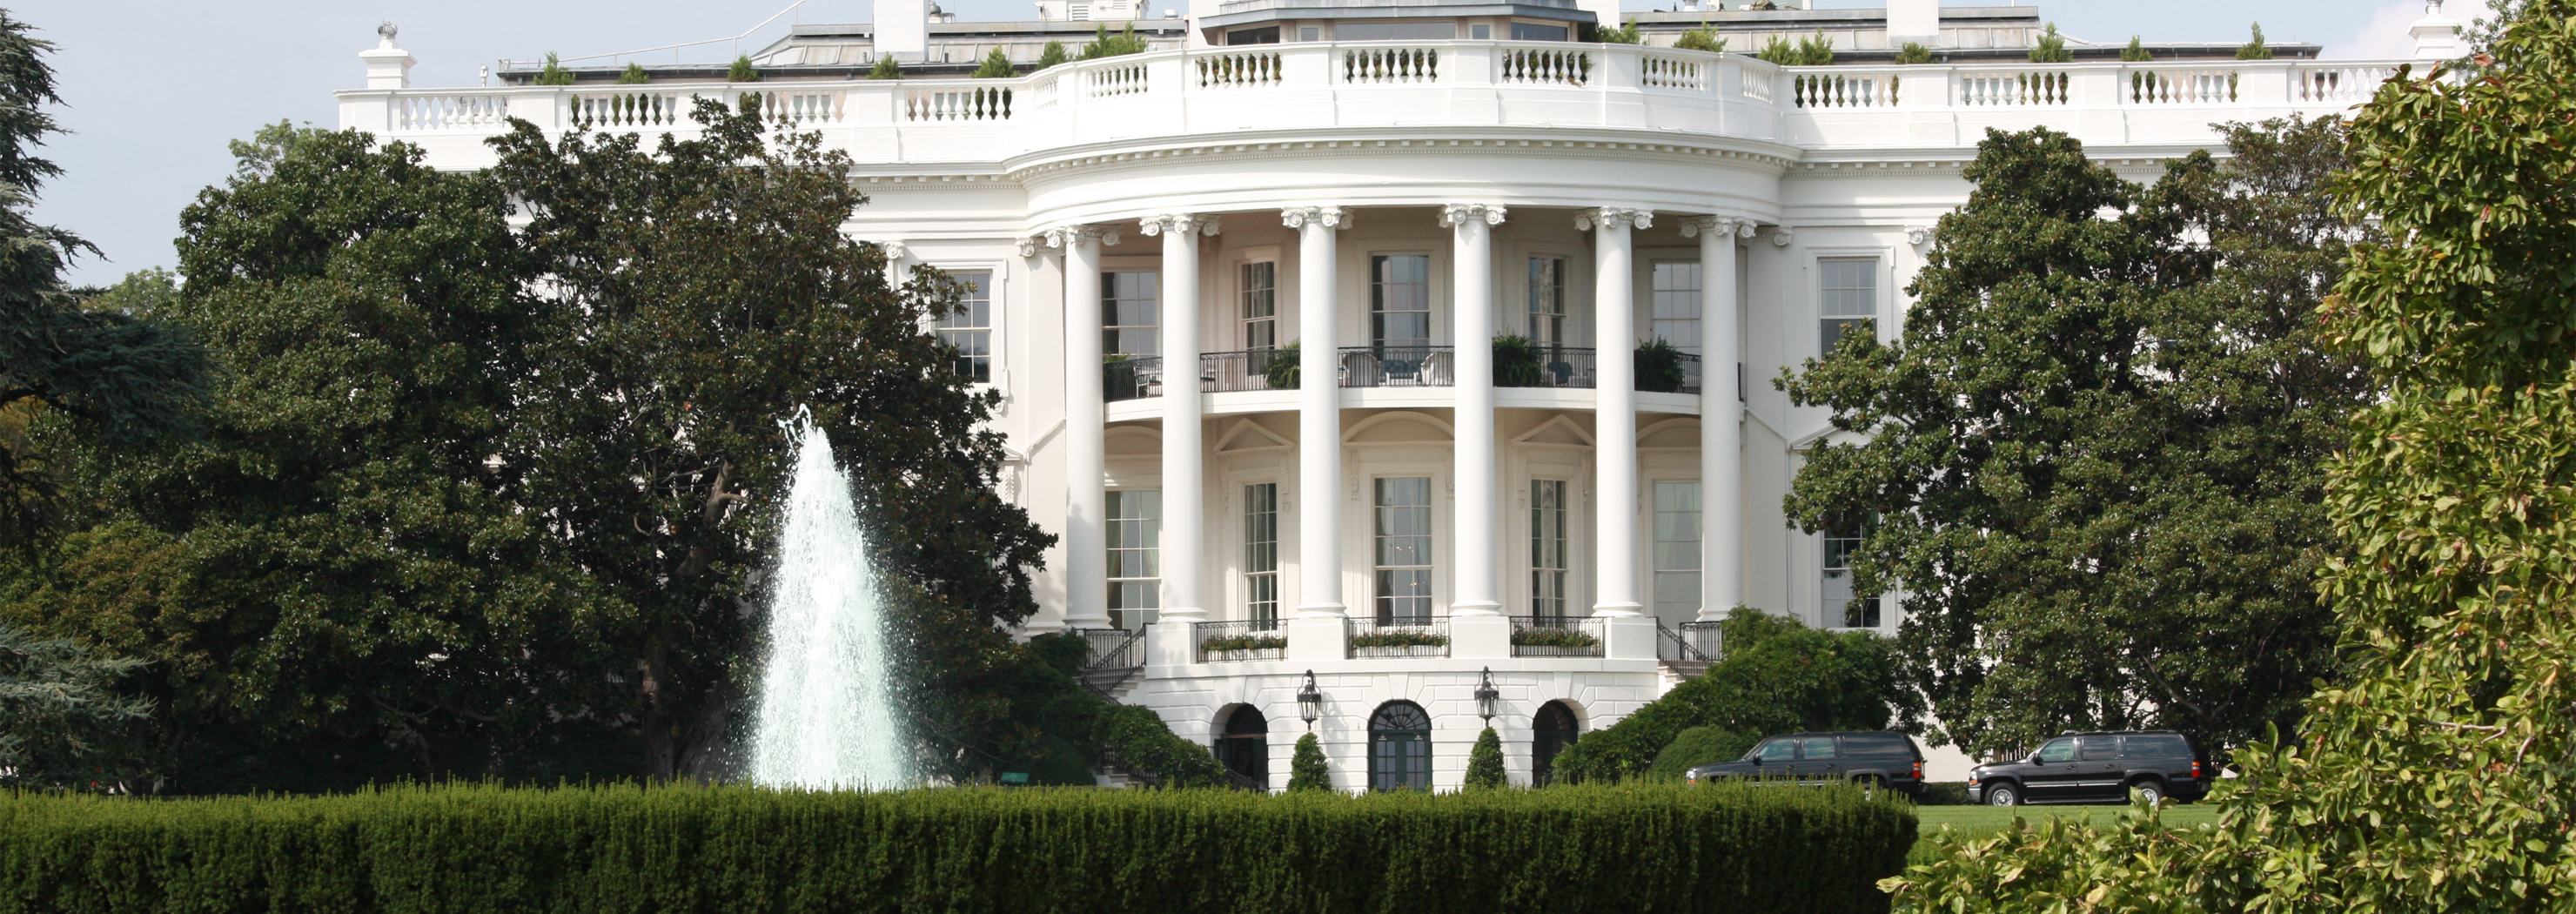 FileWhite House Washington DC Summer panoramiog